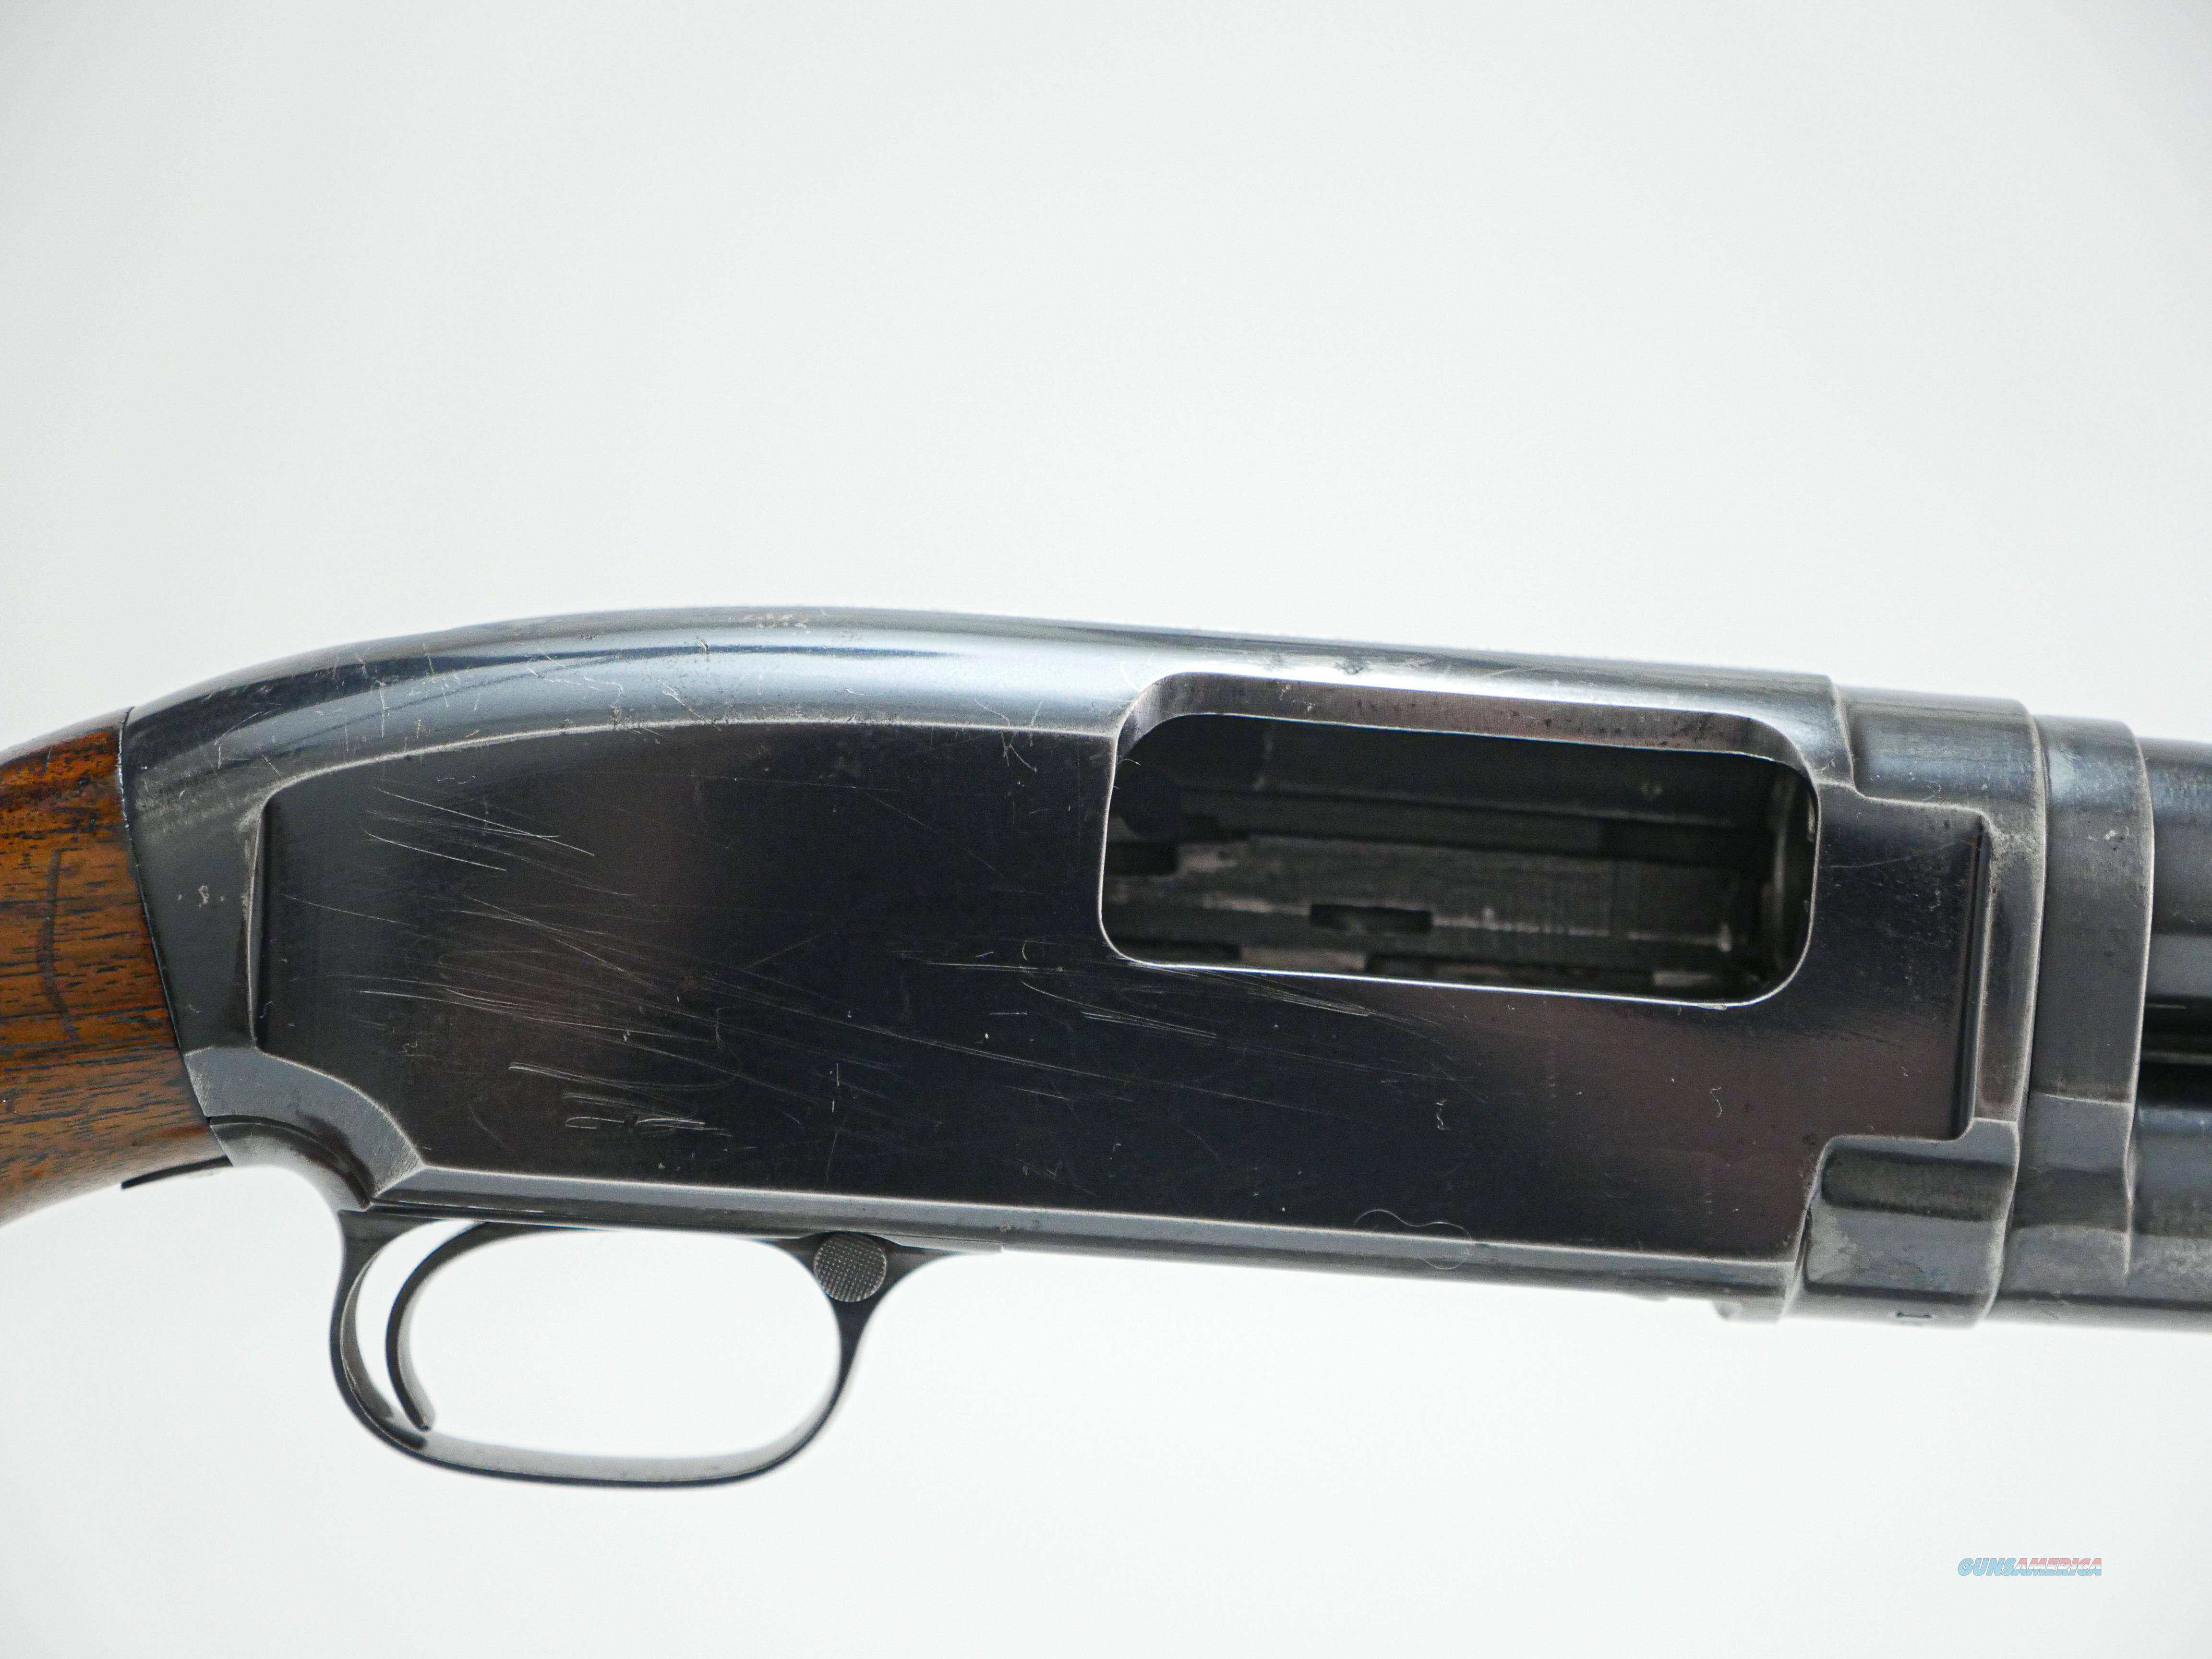 "Winchester - Model 12, Heavy Duck, 12ga. 30"" Barrels Fixed  Guns > Shotguns > Winchester Shotguns - Modern > Pump Action > Hunting"